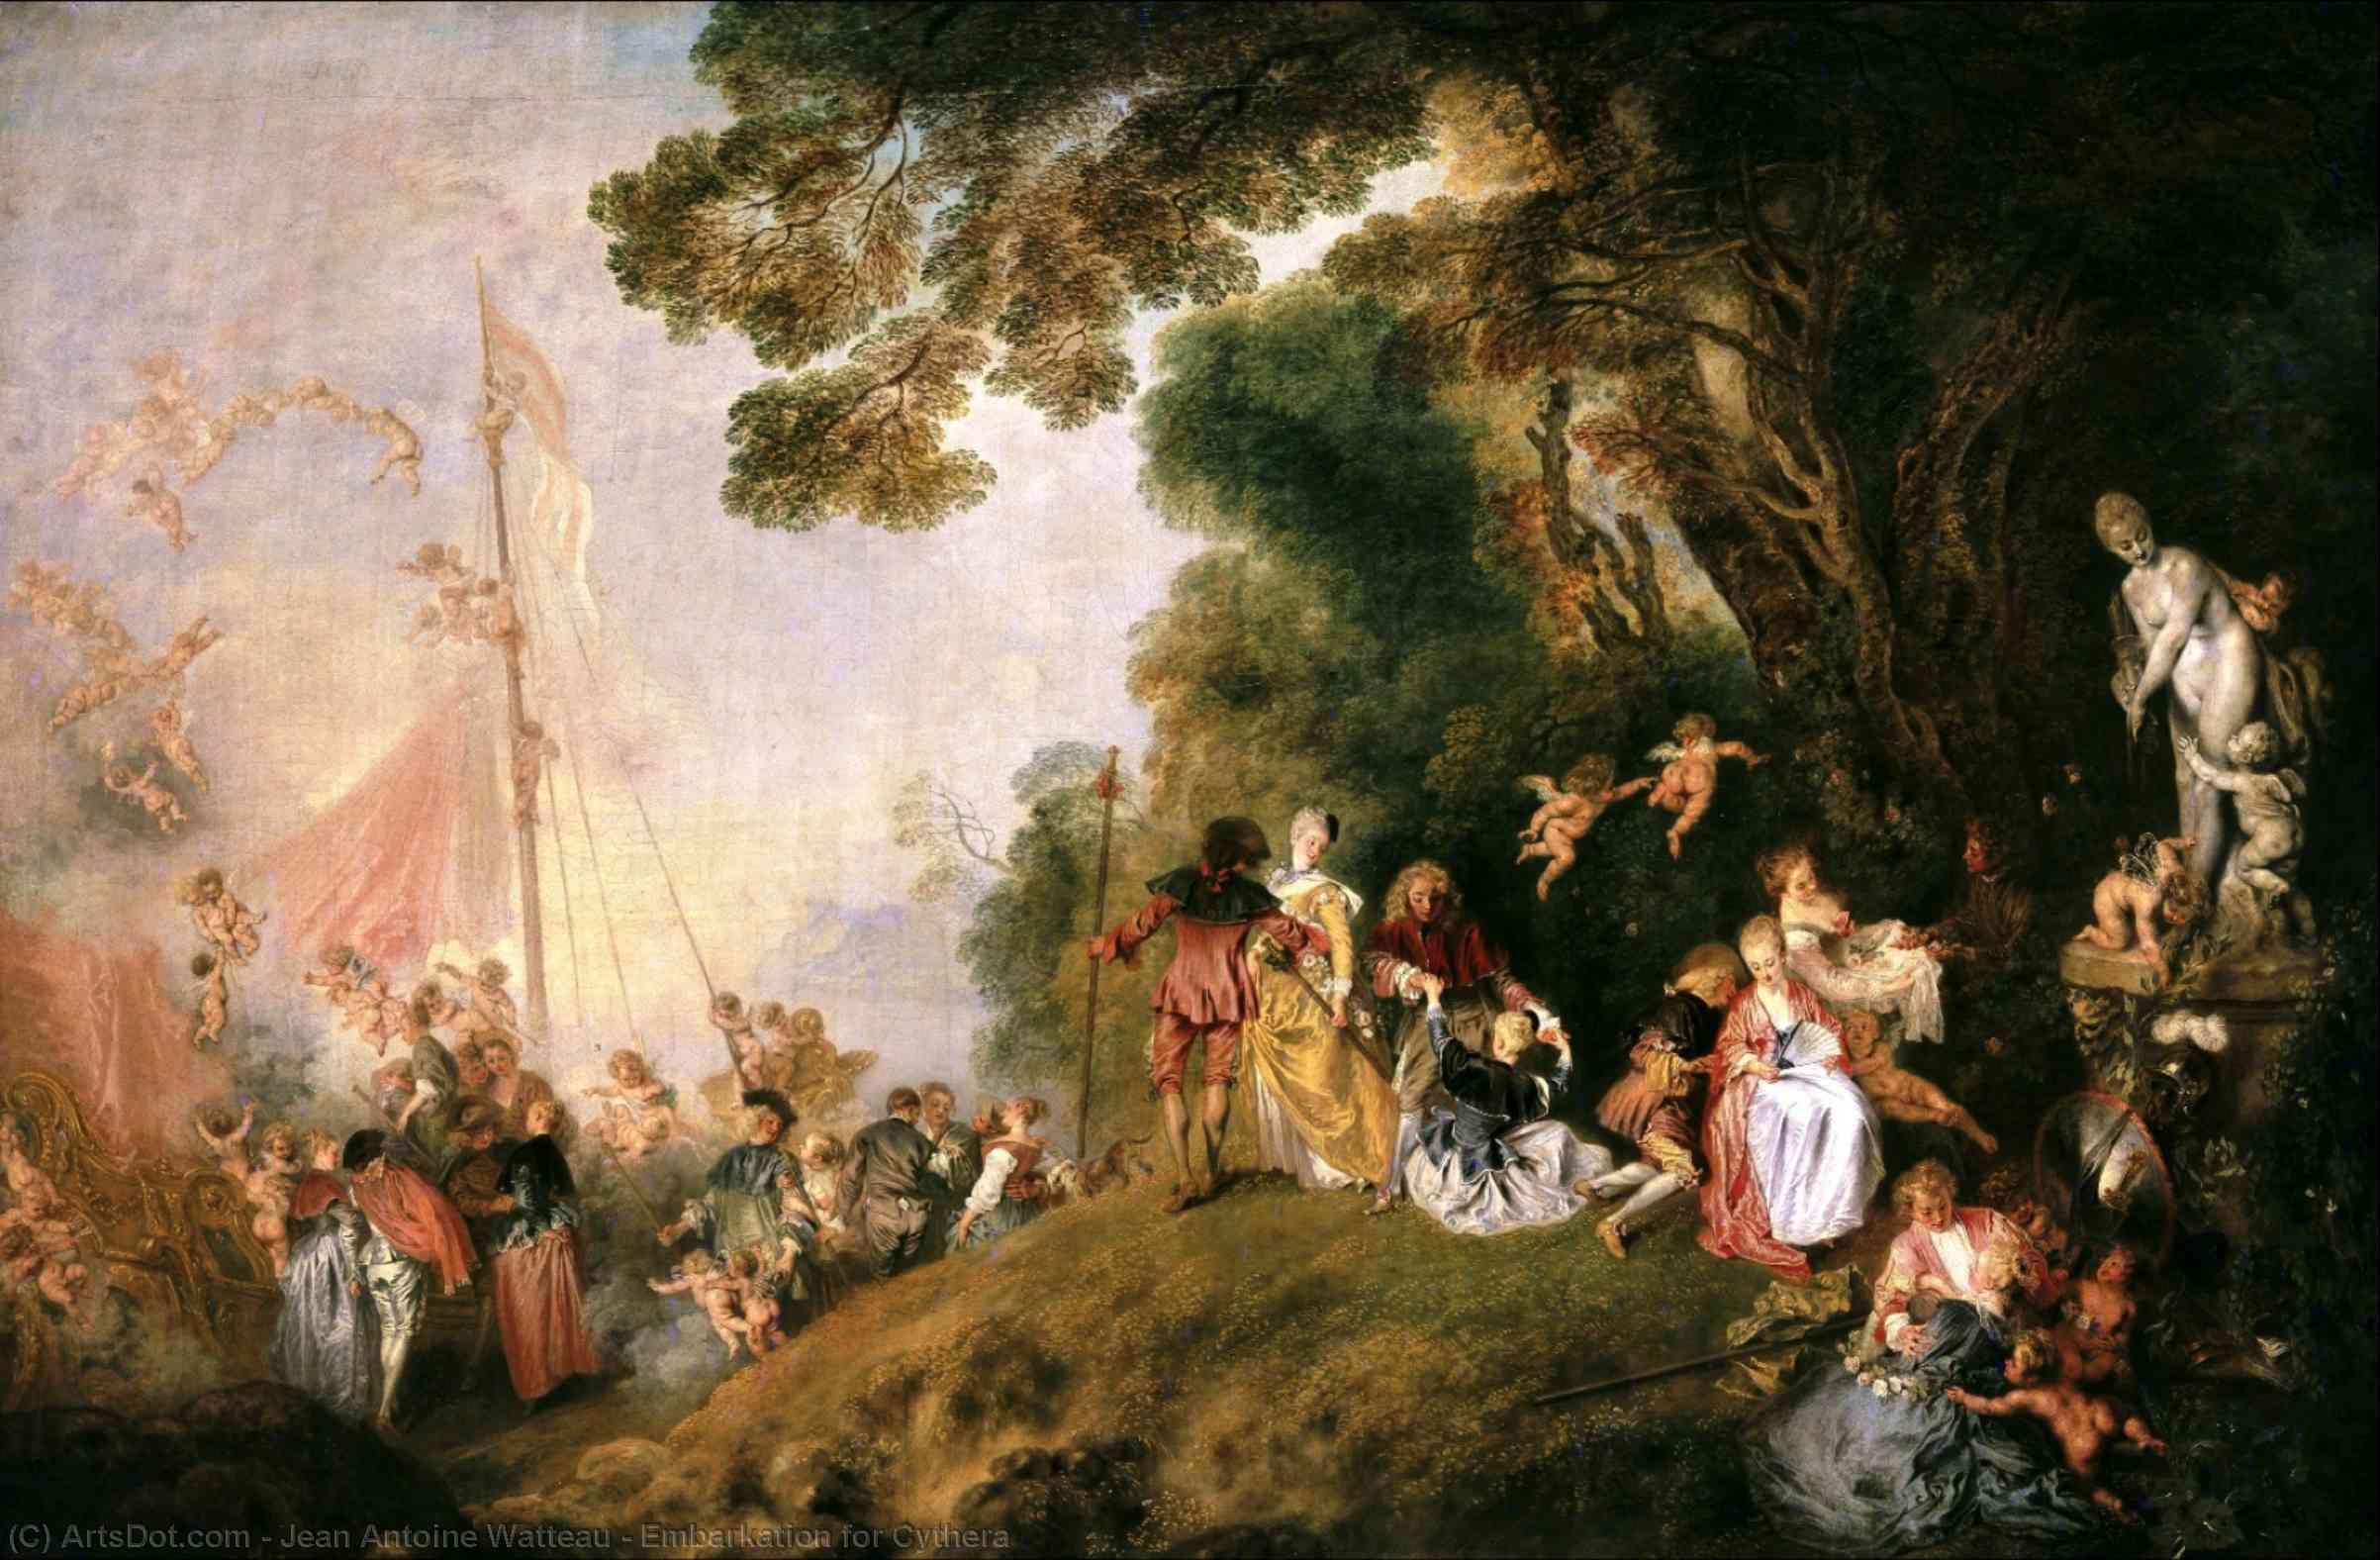 WikiOO.org - Enciklopedija dailės - Tapyba, meno kuriniai Jean Antoine Watteau - Embarkation for Cythera